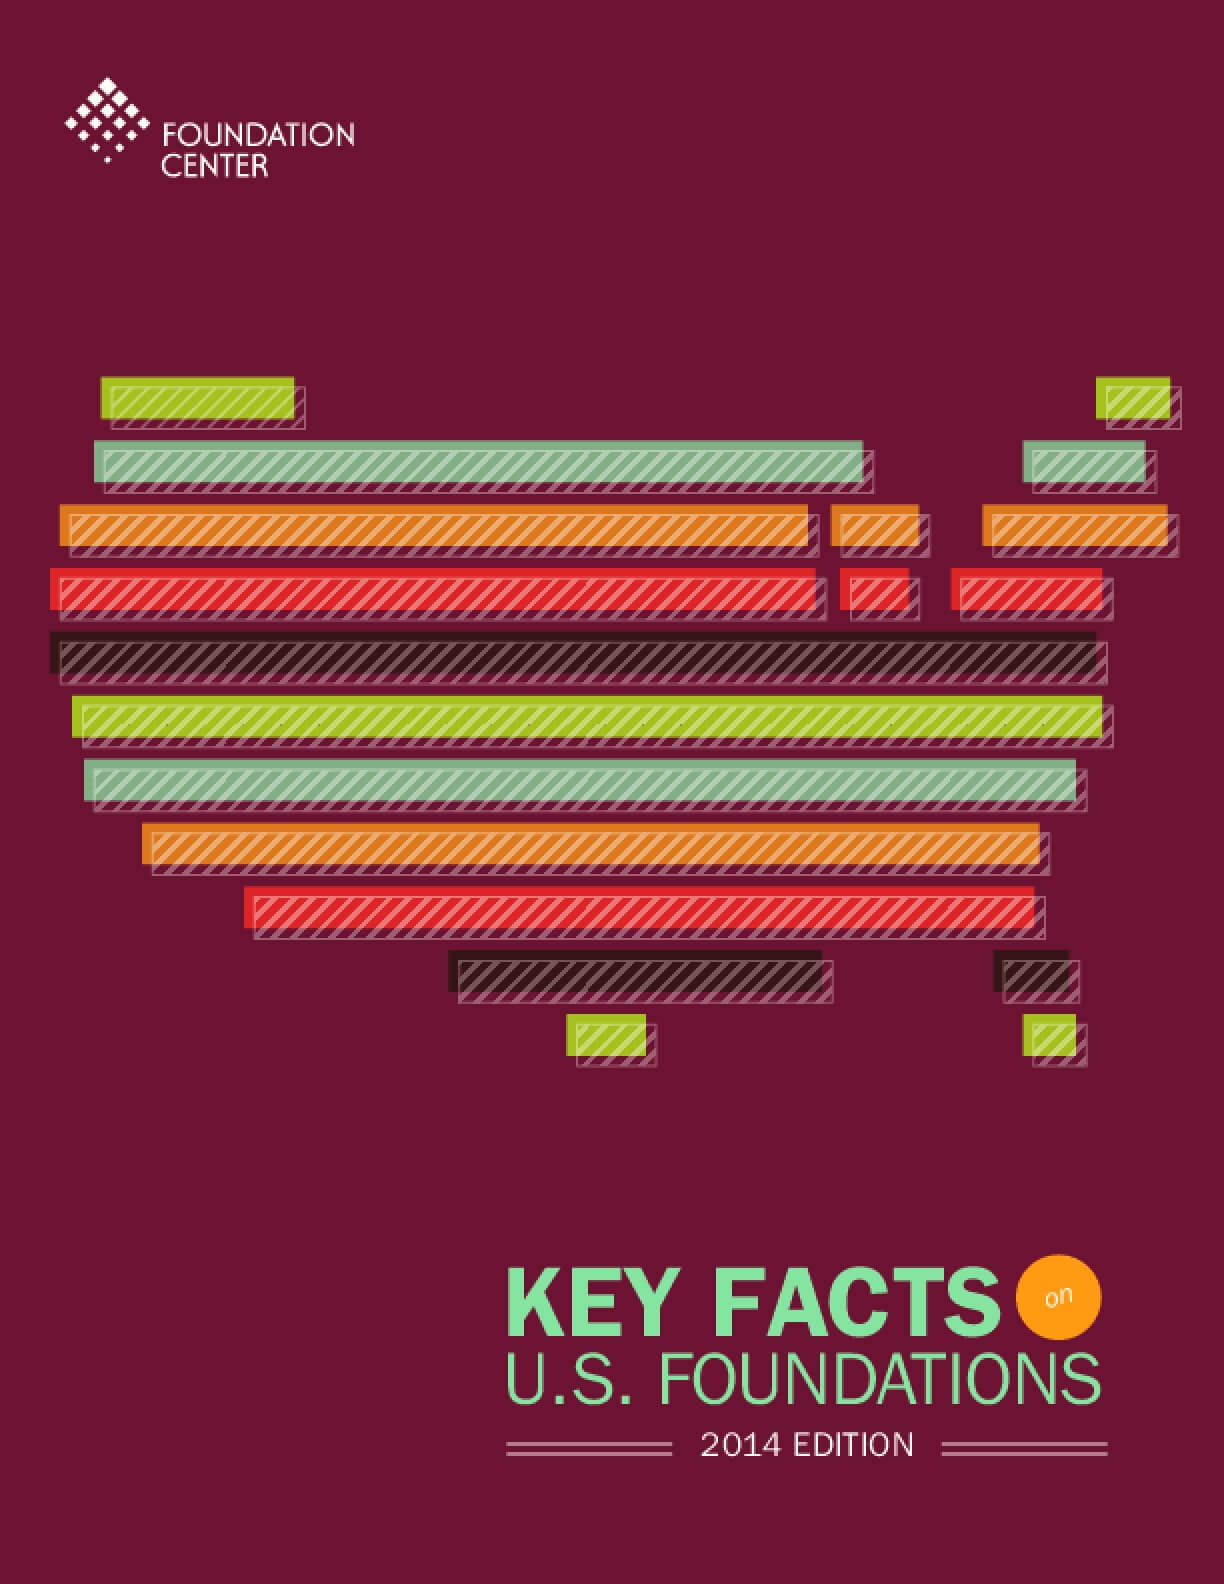 Key Facts on U.S. Foundations 2014